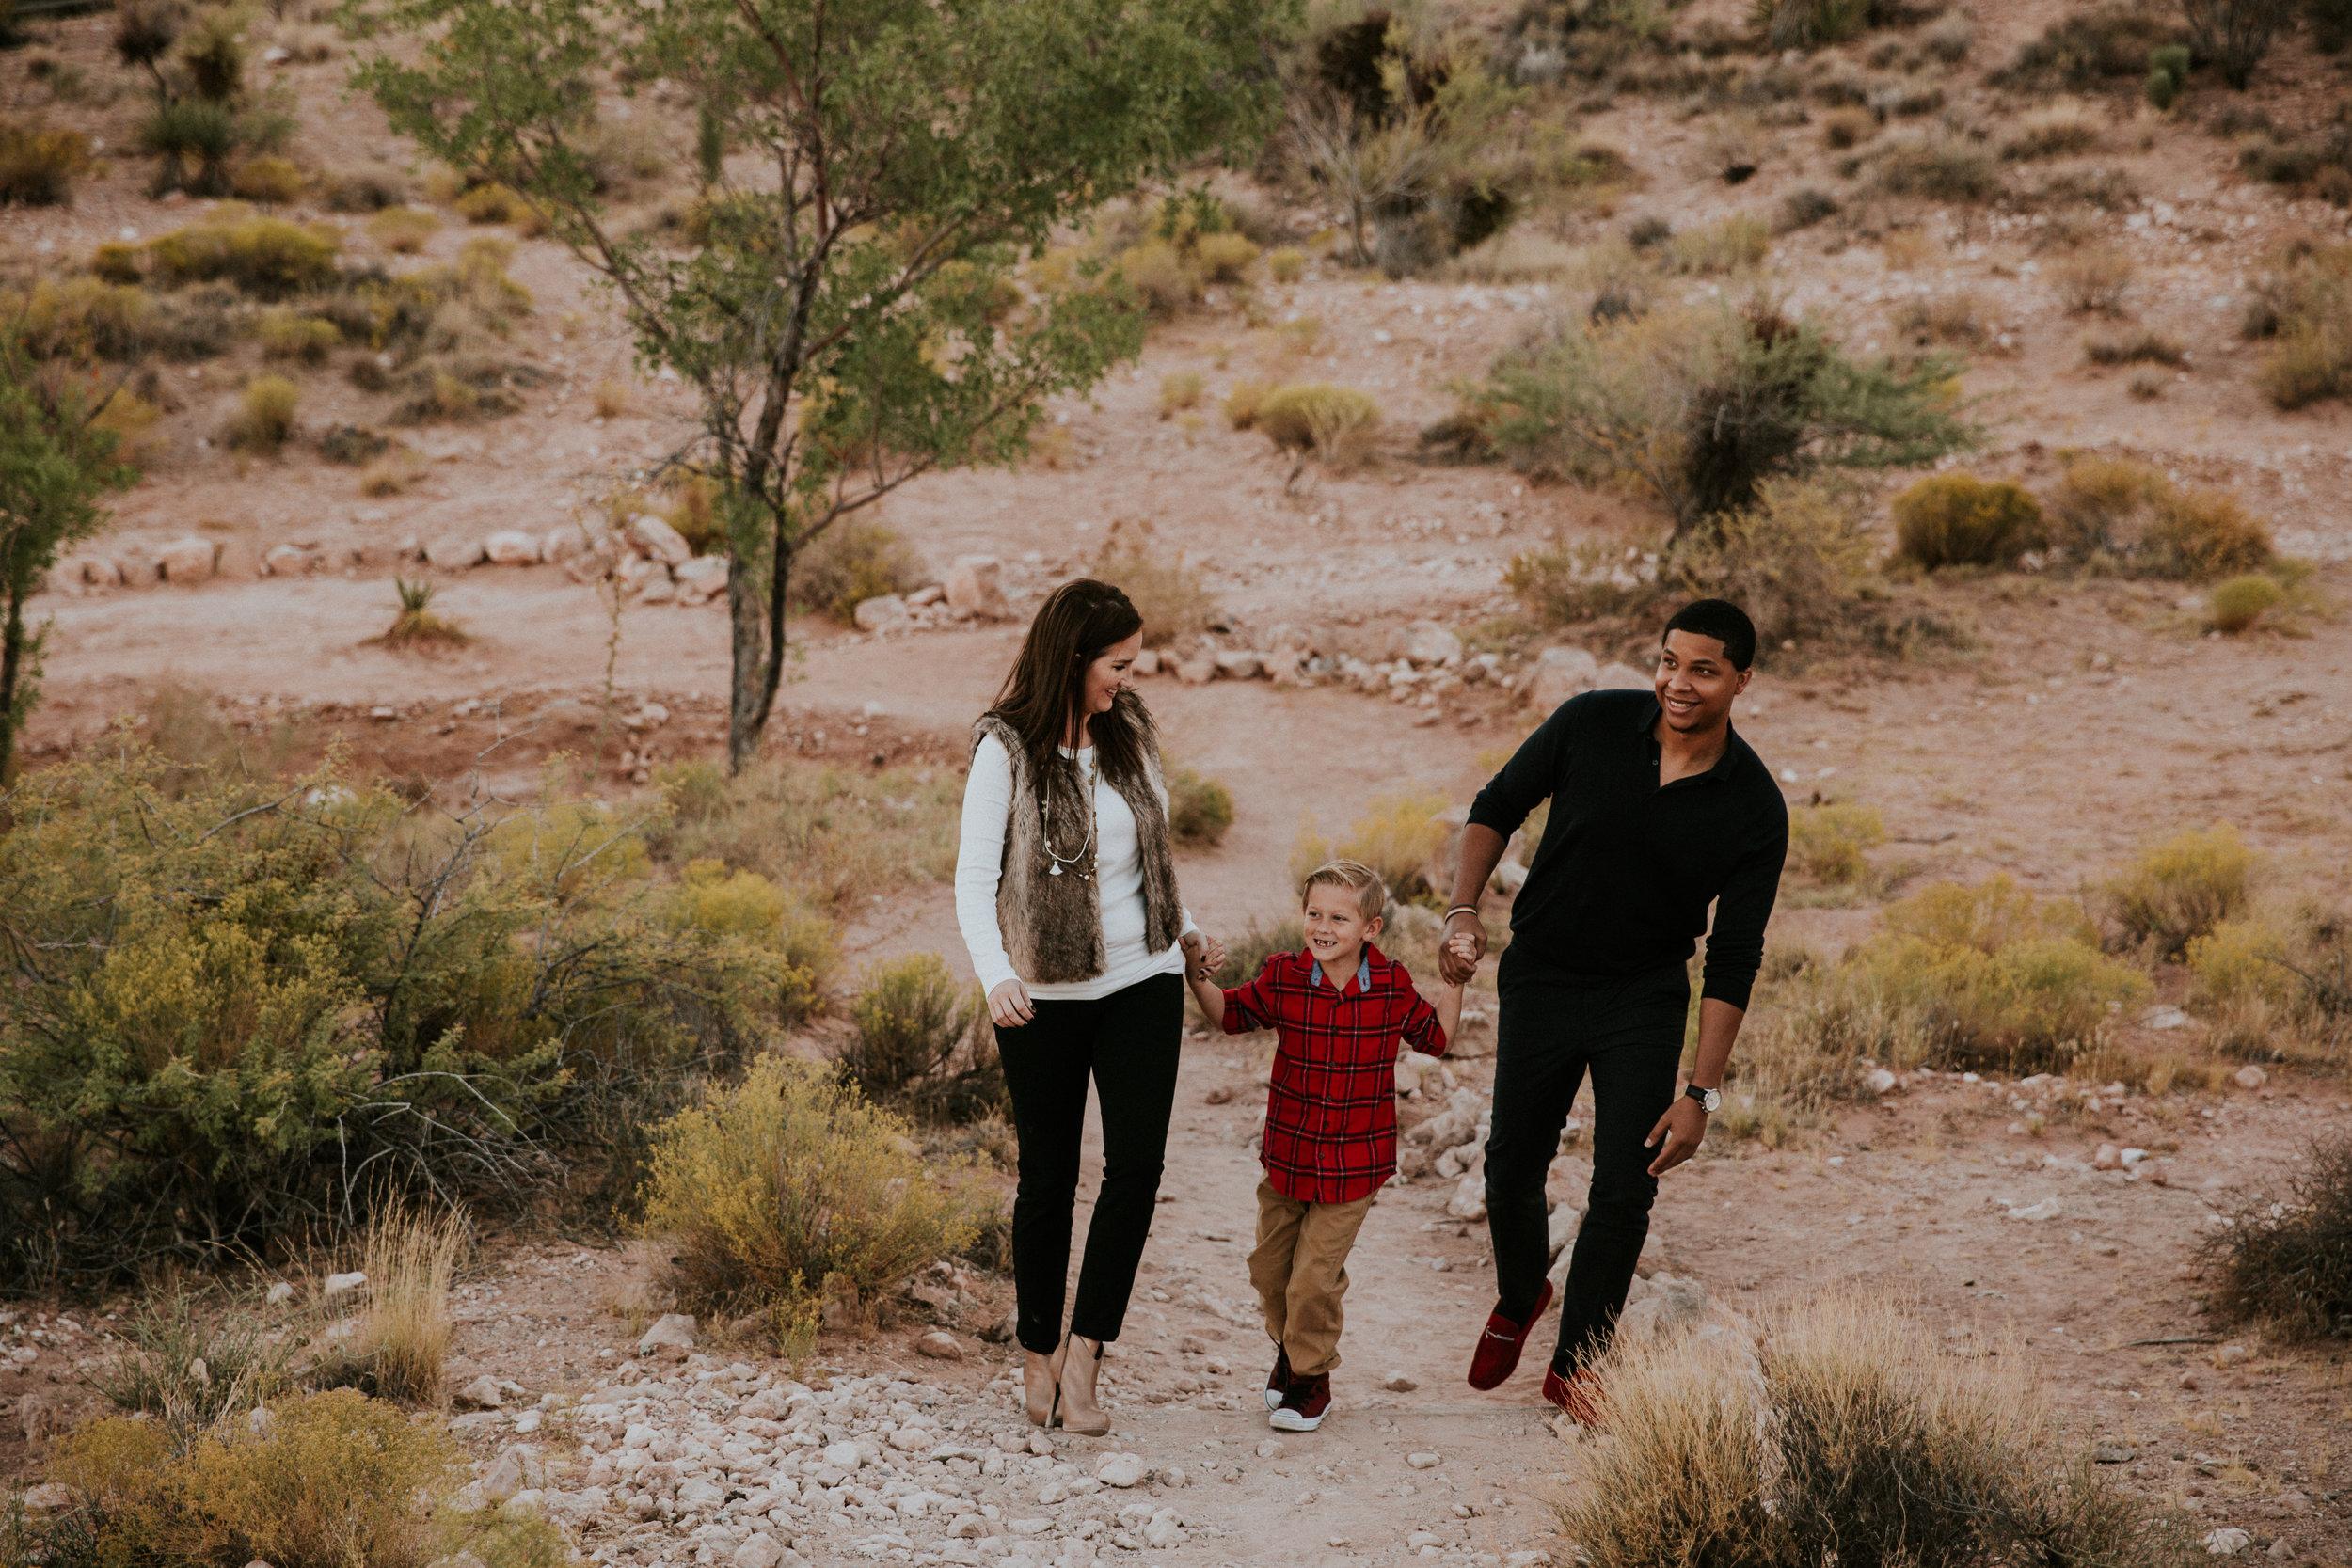 Las Vegas Family Photography - Family Photographer - Lifestyle Family Photography - Calico Basin - Red Spring - Nevada - Documentary